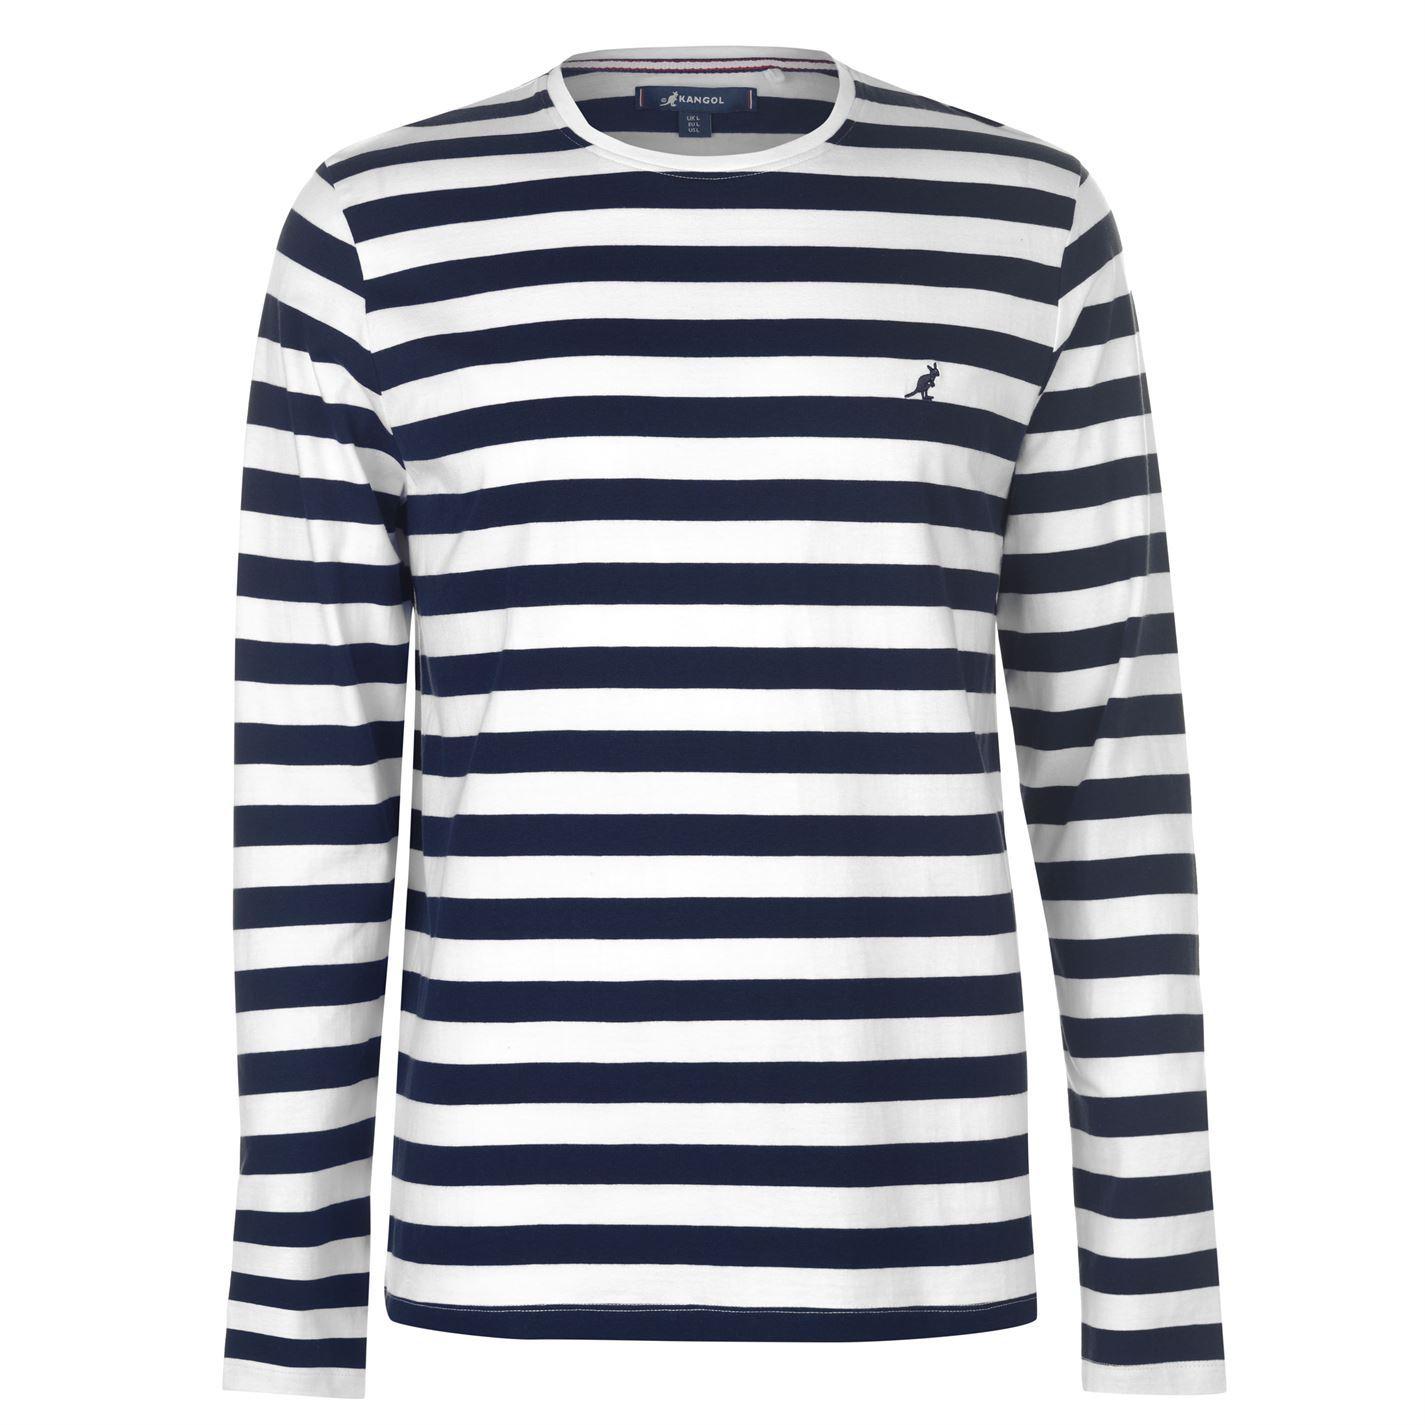 Kangol-Long-Sleeve-T-Shirt-Mens-Tee-Shirt-Top thumbnail 7